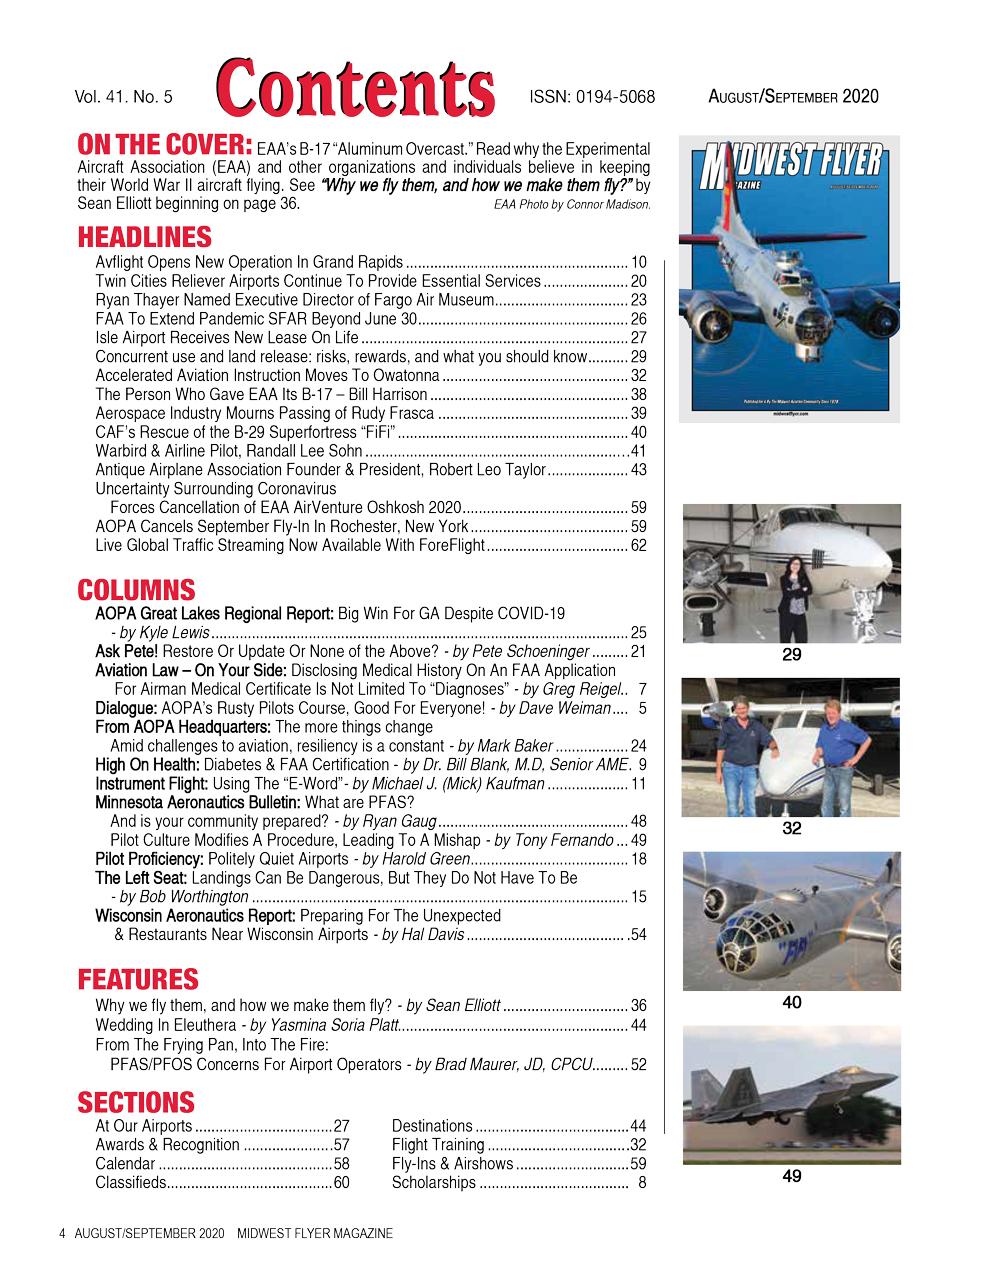 Midwest Flyer Magazine Contents - Aug/Sept